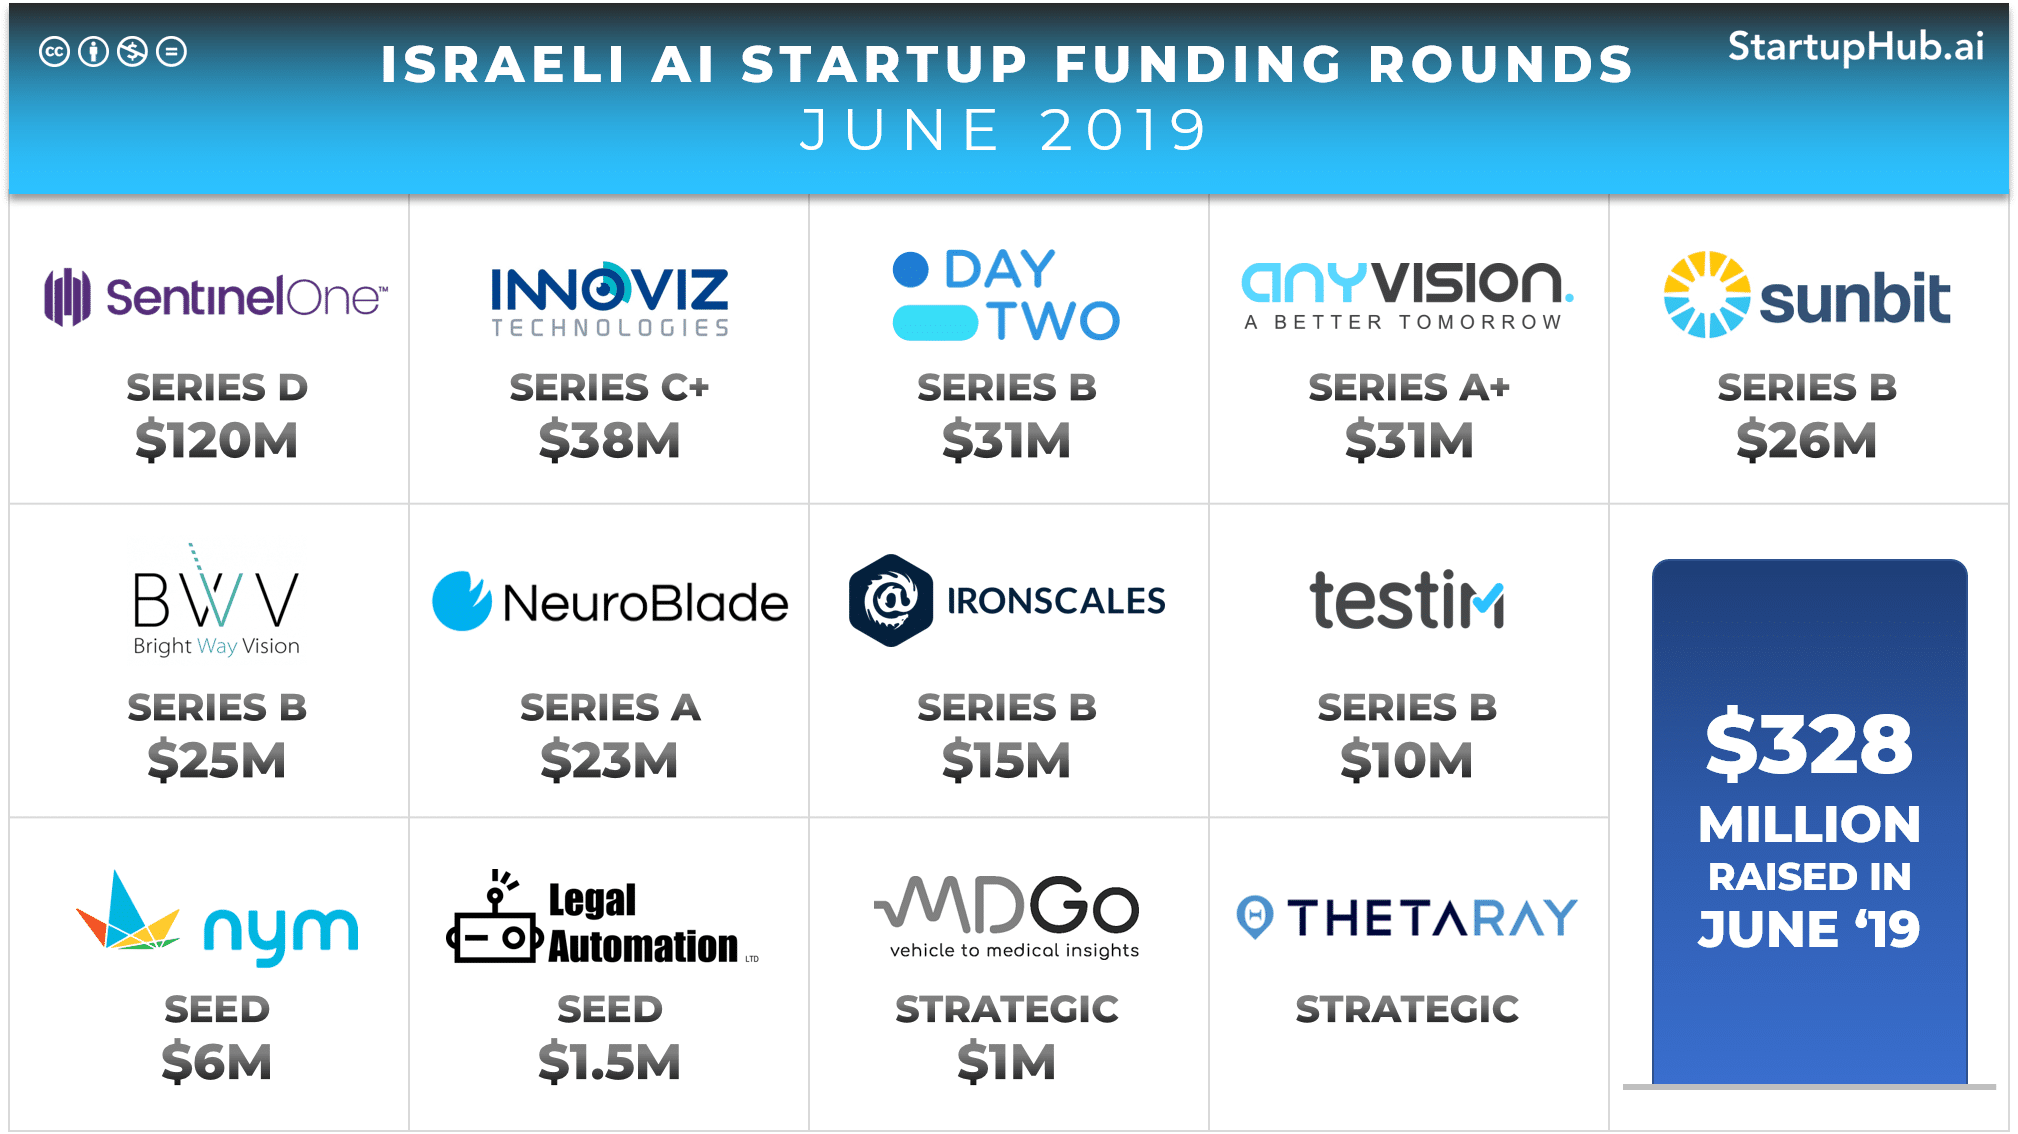 Israeli AI Startup Funding Rounds of June 2019